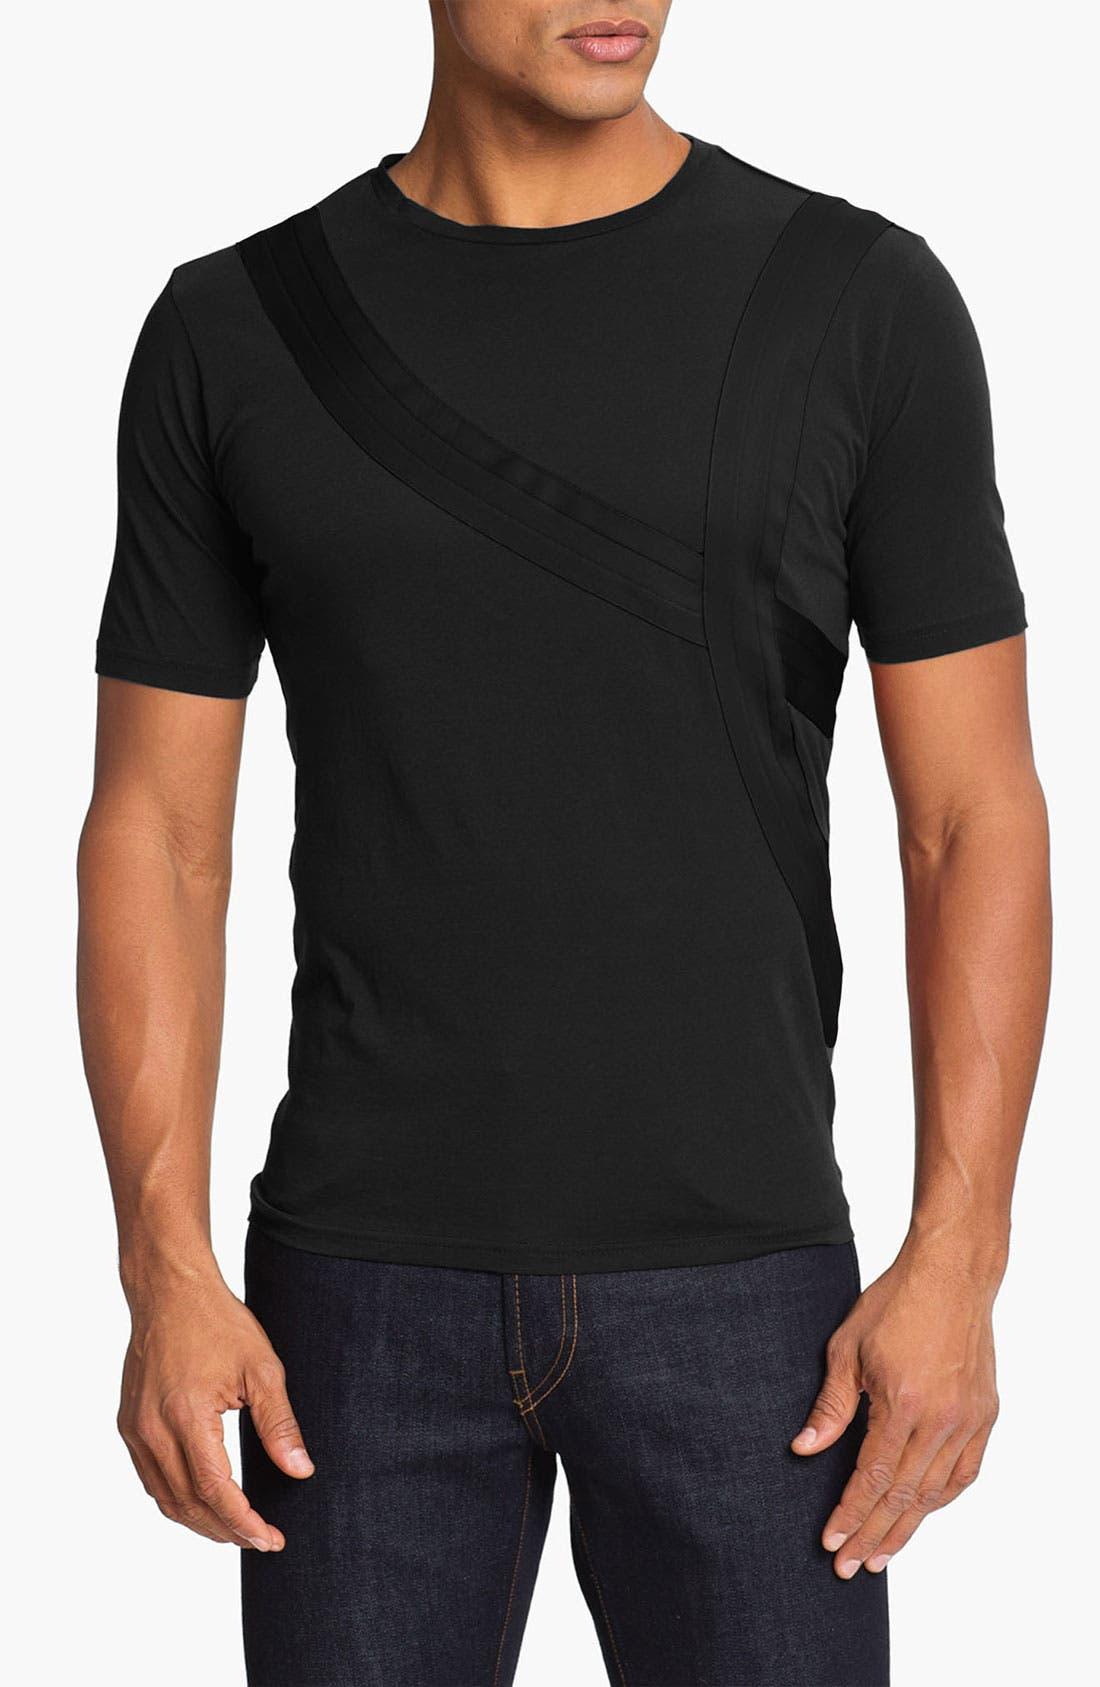 Main Image - adidas SLVR 'Bonded' T-Shirt